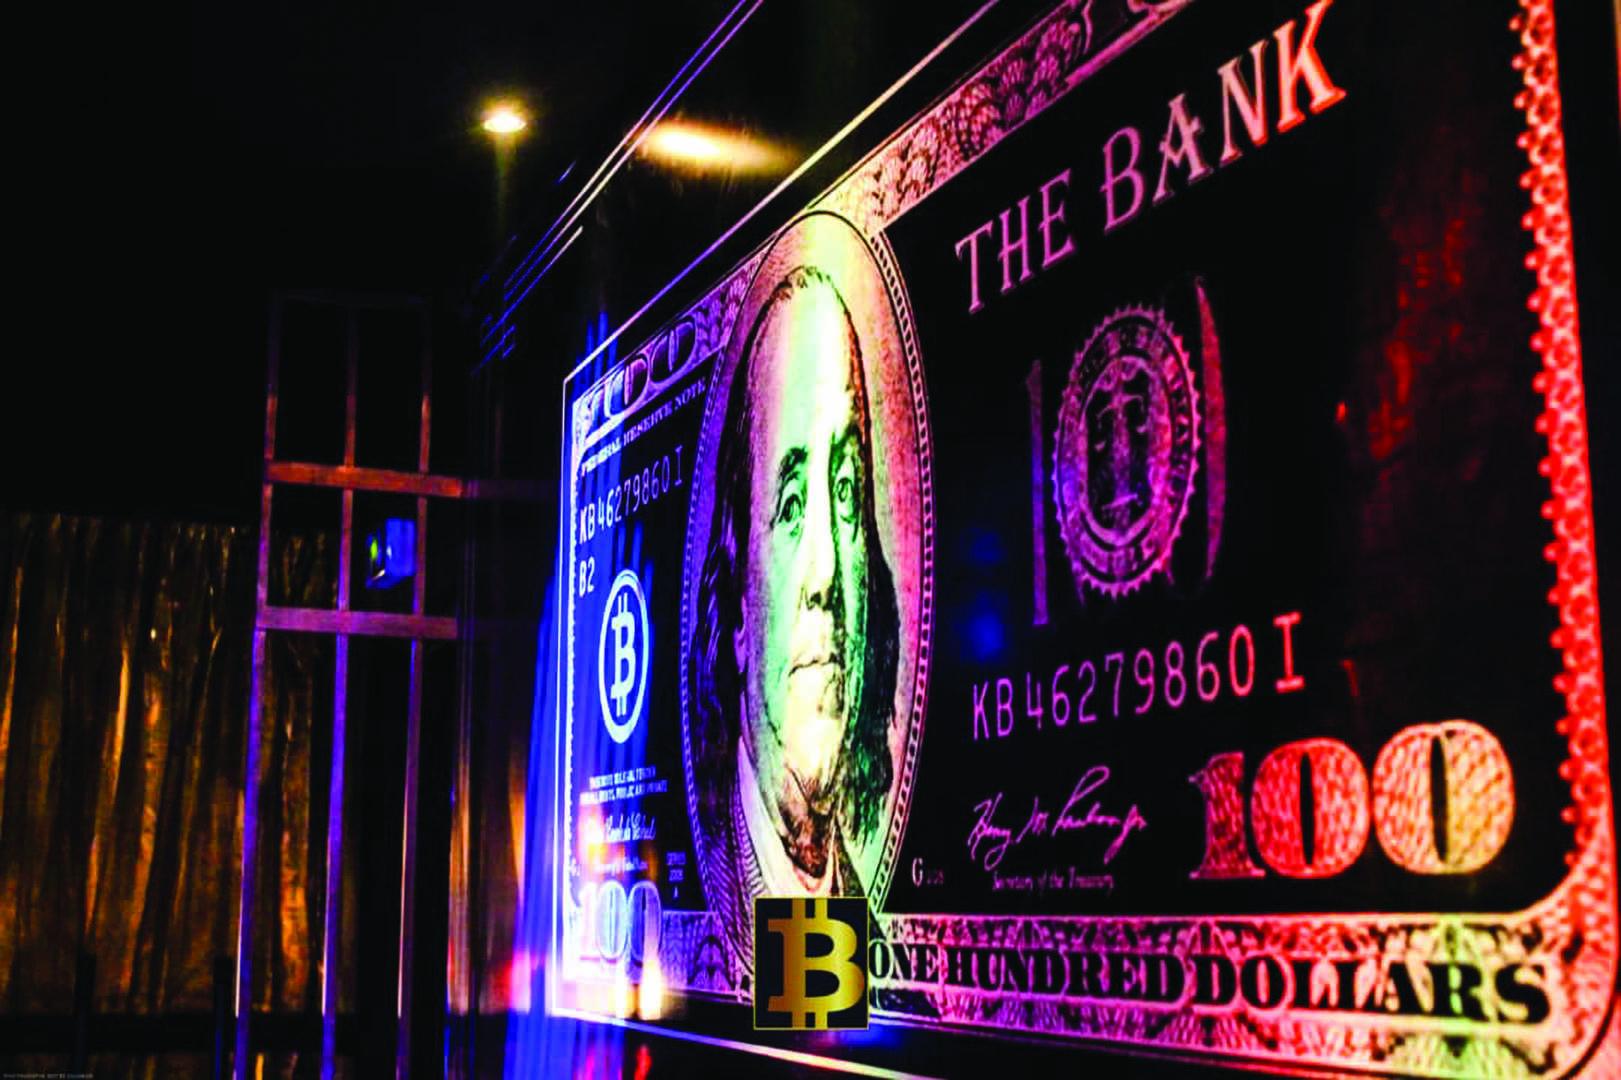 The Bank : money, power, respect